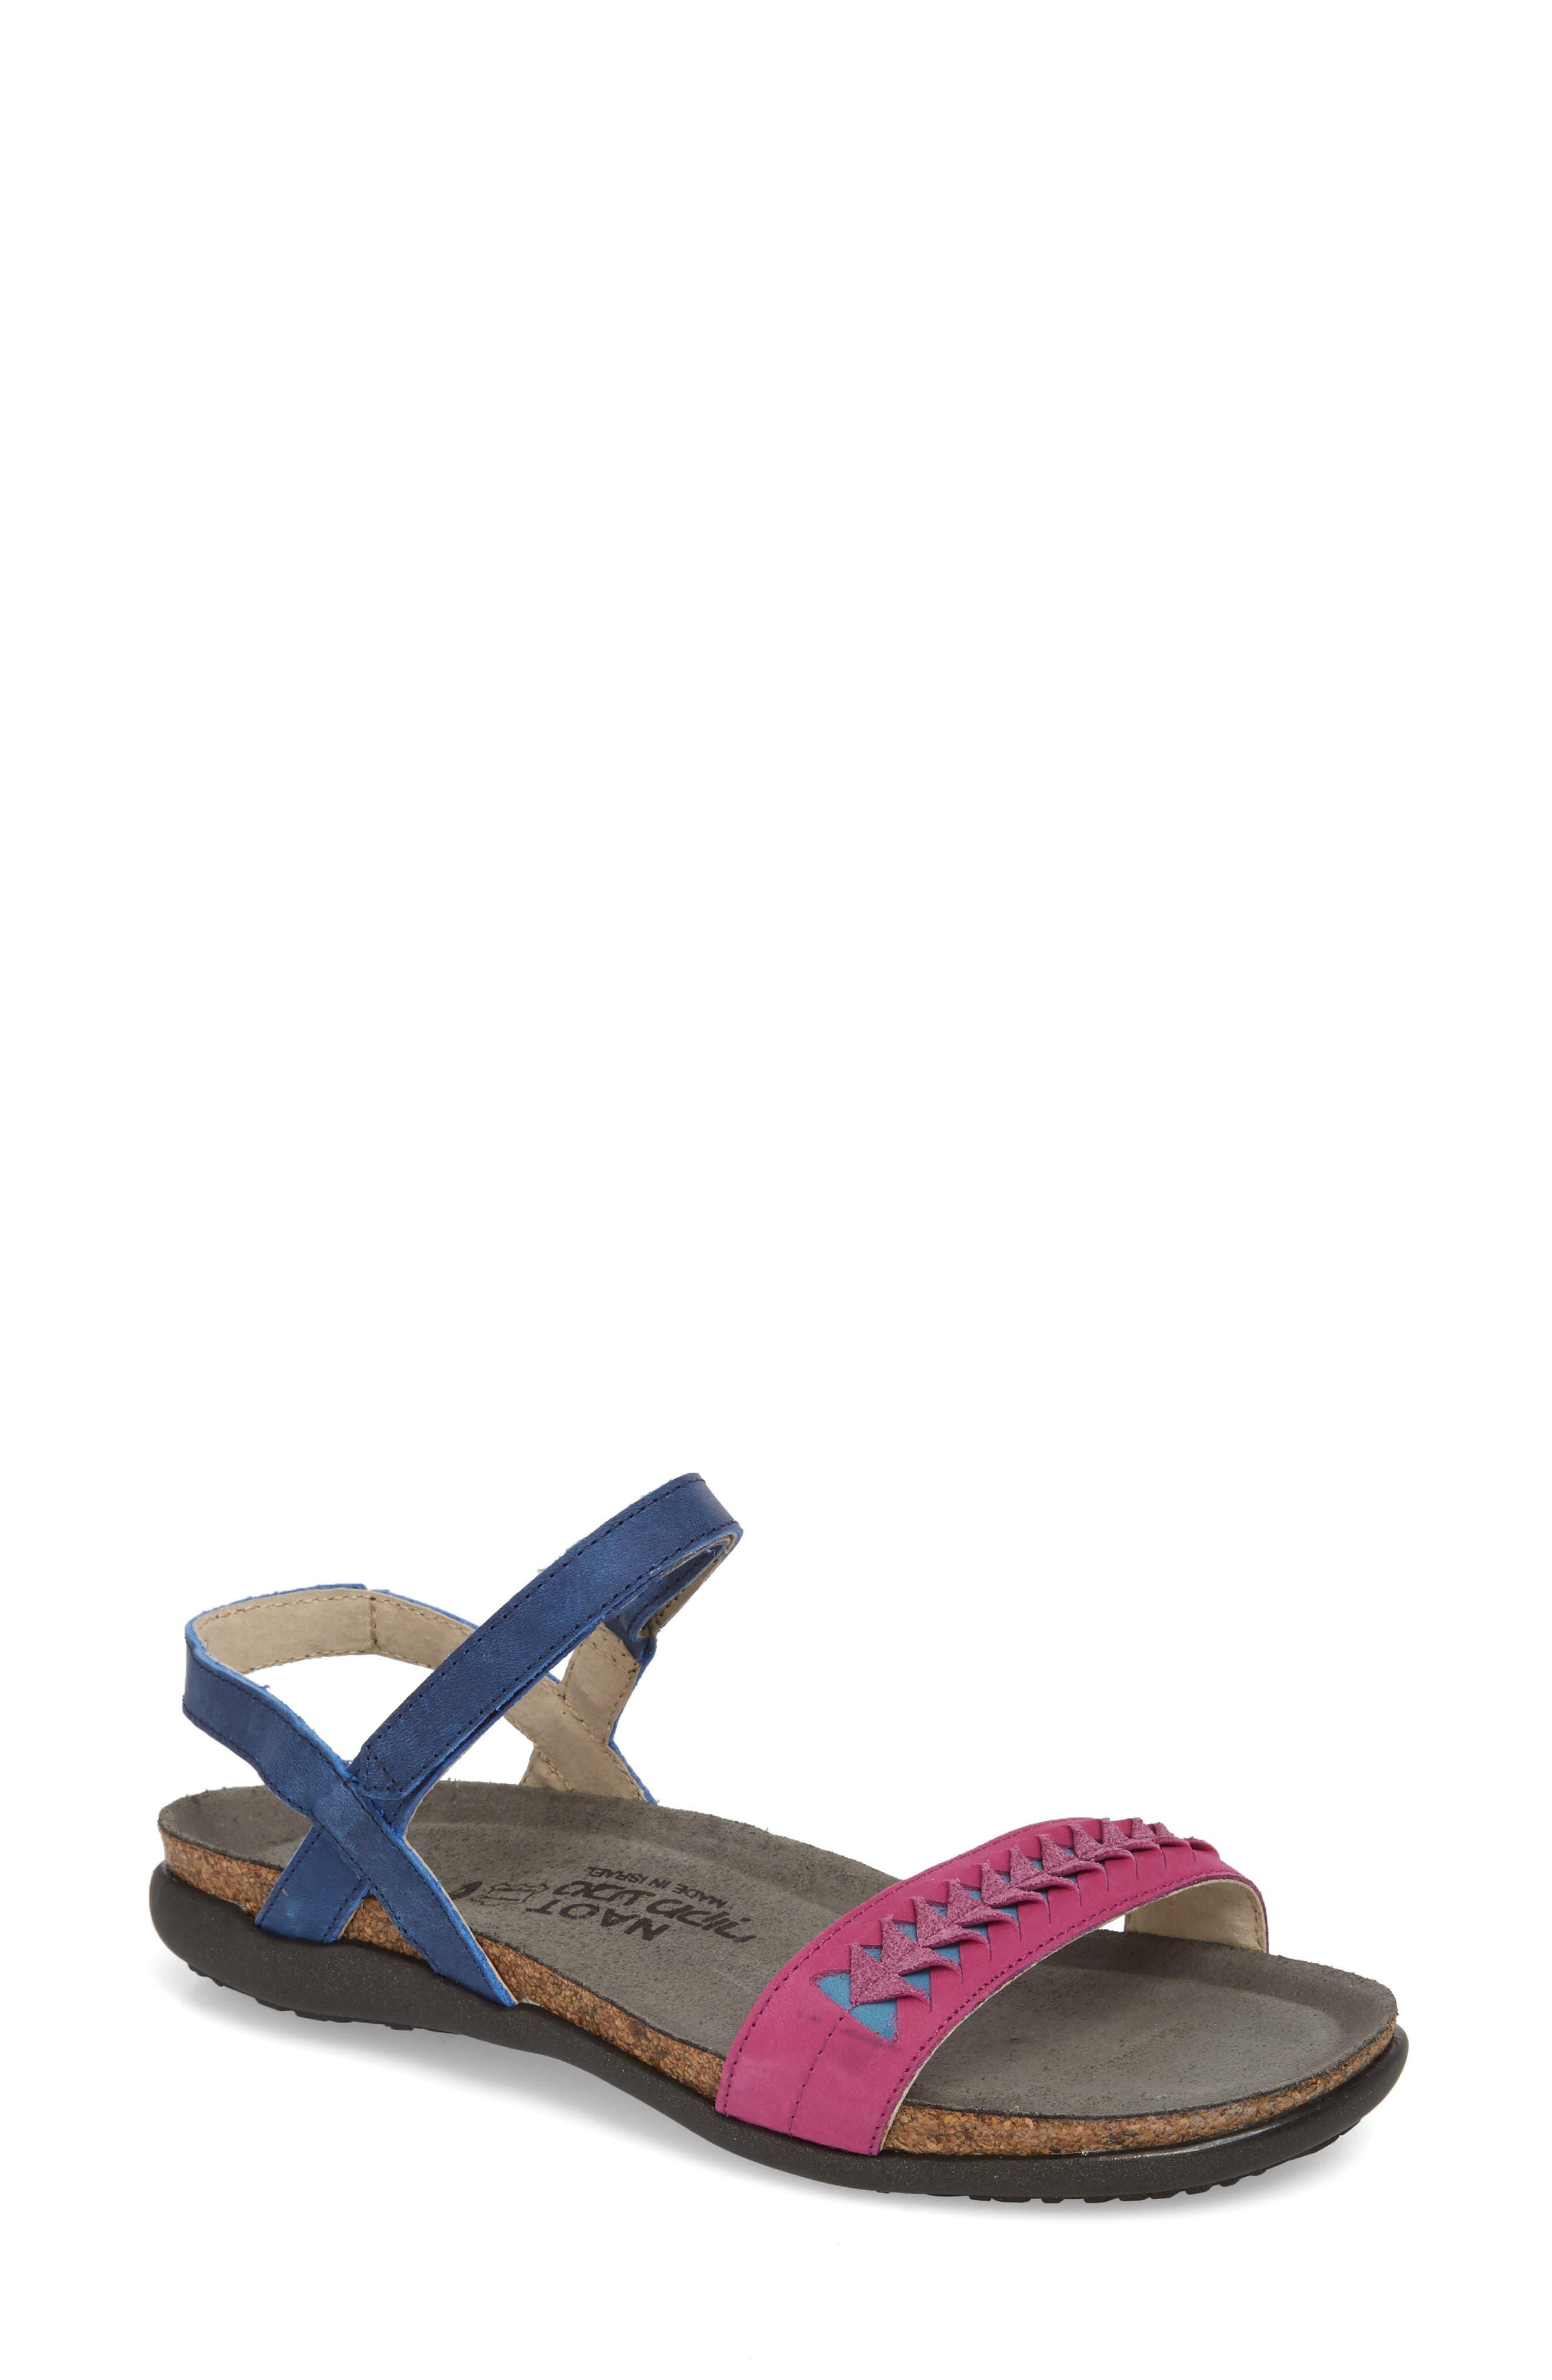 Naot Women's Marble Sandal 5CyHS